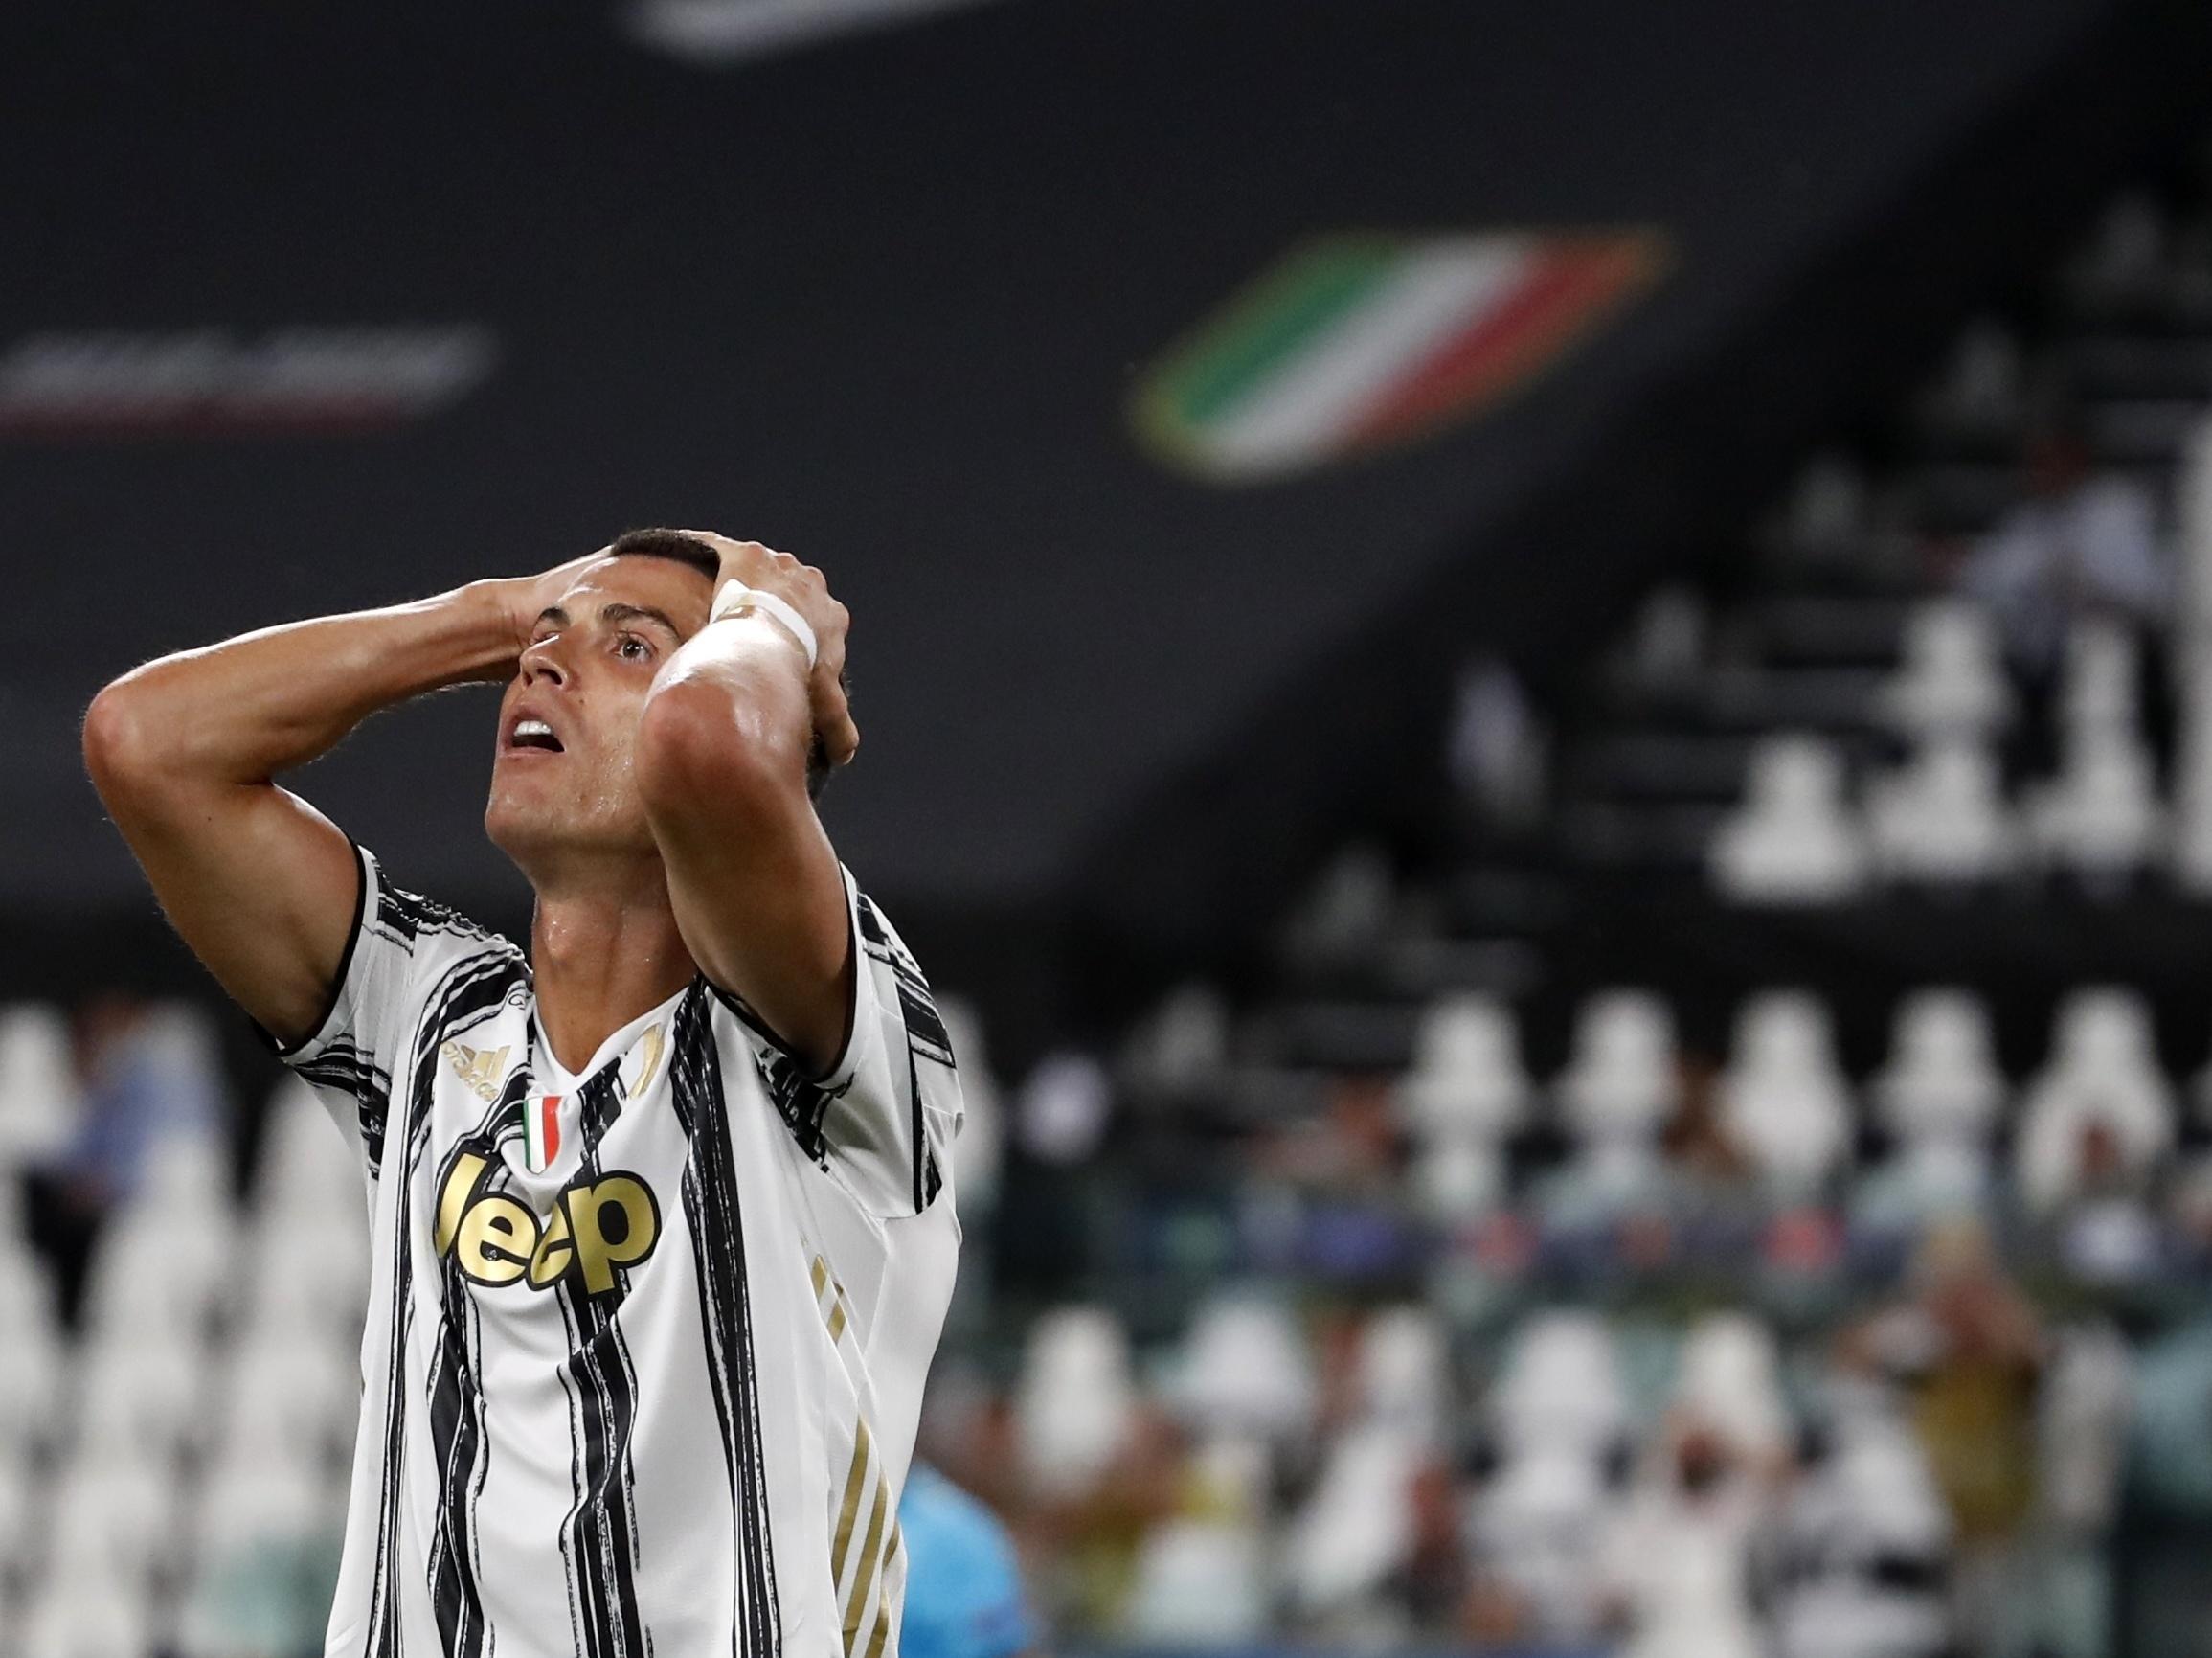 Lyon Advance Champions League Will Lose Its Charm Without Cristiano Ronaldo Cricketsoccer